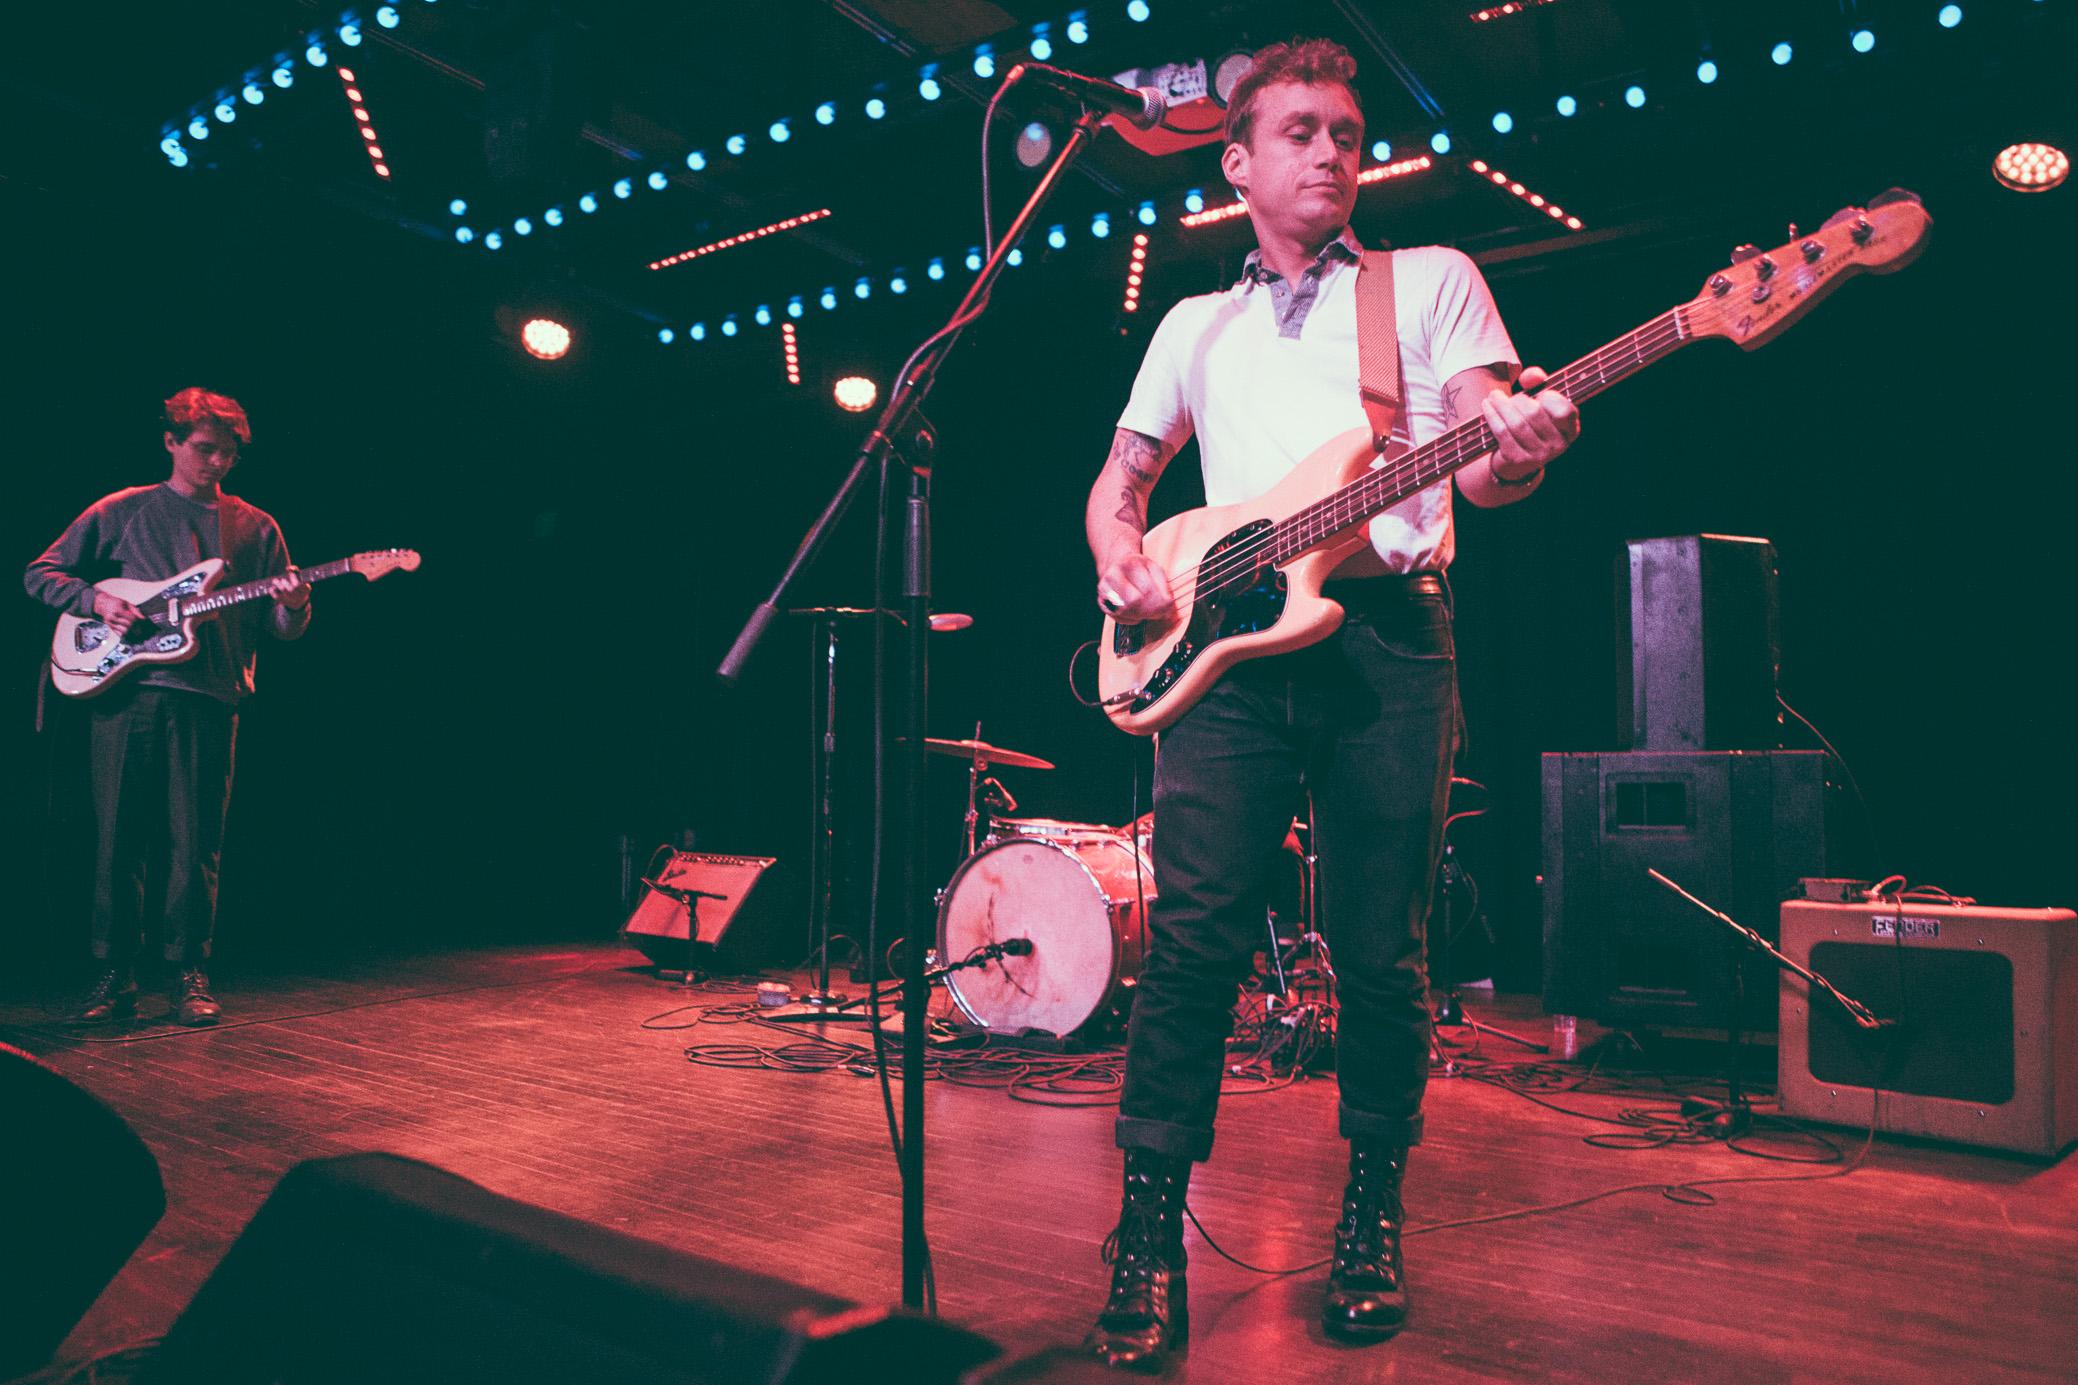 Omni performs in concert at Saturn Birmingham in Birmingham, Alabama on February 16th, 2018. (Photo by David A. Smith/DSmithScenes)